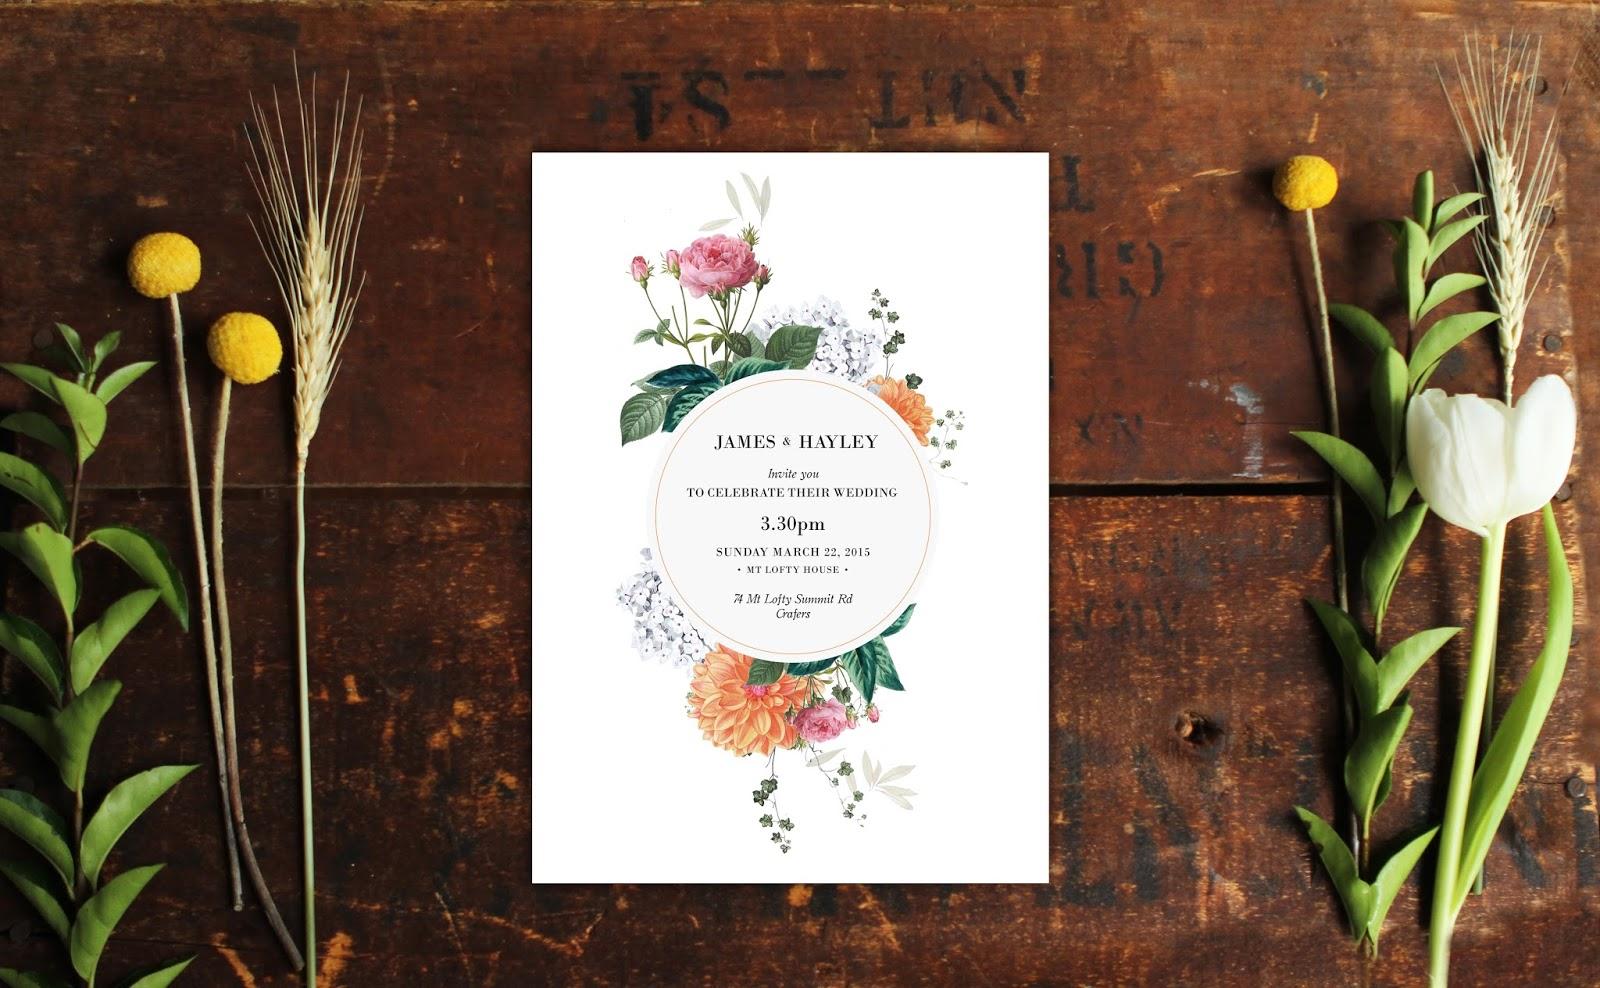 Vintage botanical wedding invitations sail swan vintage botanical wedding invitations floral wedding stationery australia perth melbourne adelaide sydney rustic chic glam pretty stopboris Image collections